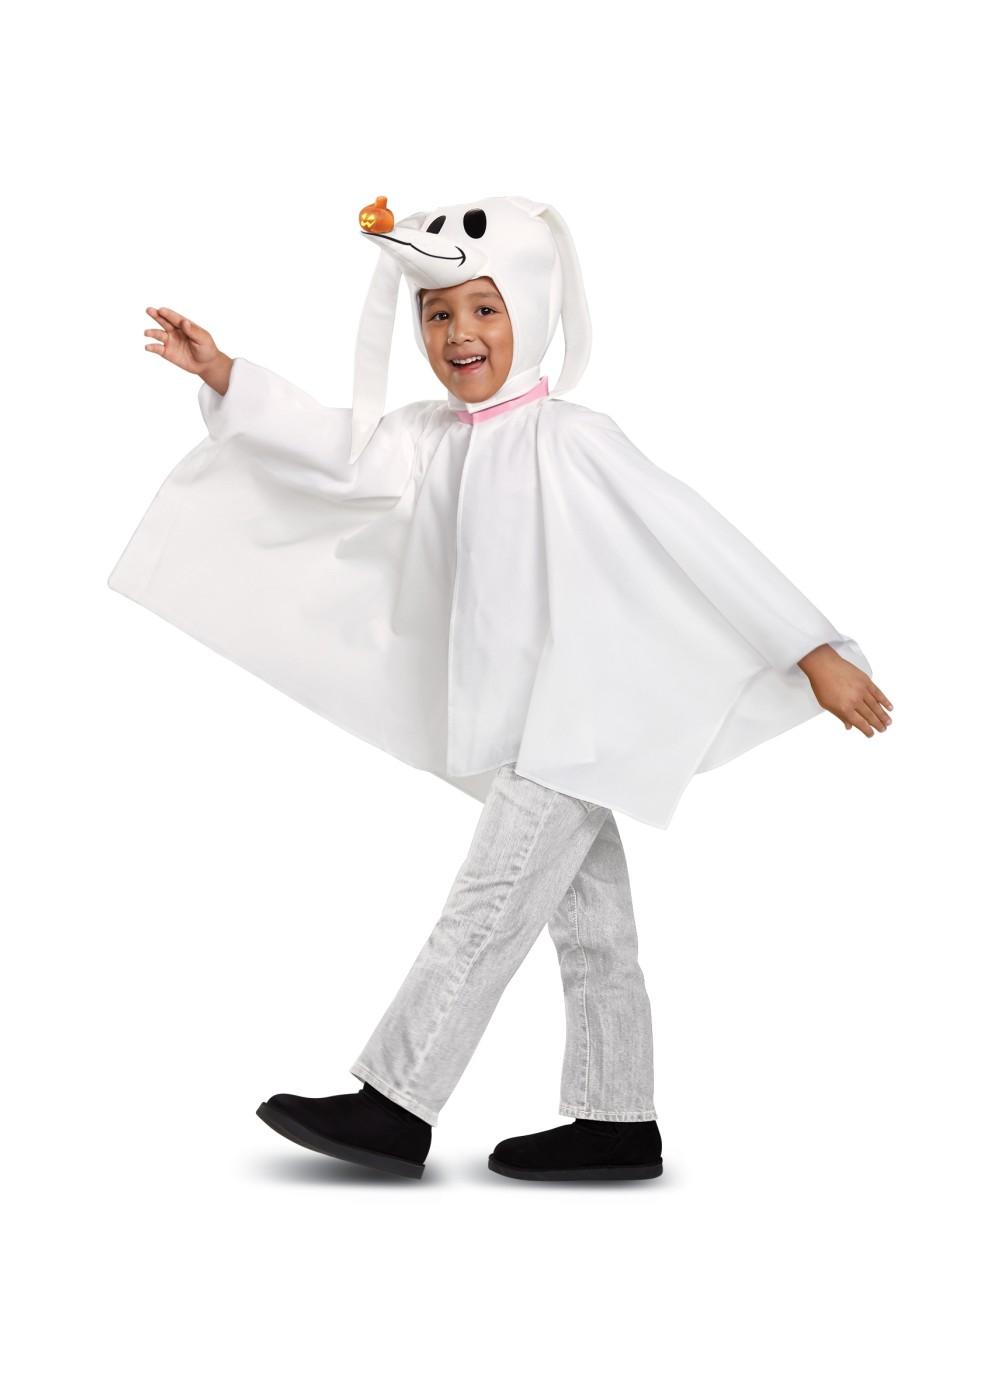 Dining 2018 Toddler Ghost Costume Homemade Children S Ghost Costume Ideas Zero Toddler Disney Classic Costume Zero Classic Toddler Costume Holiday Costumes New baby Toddler Ghost Costume